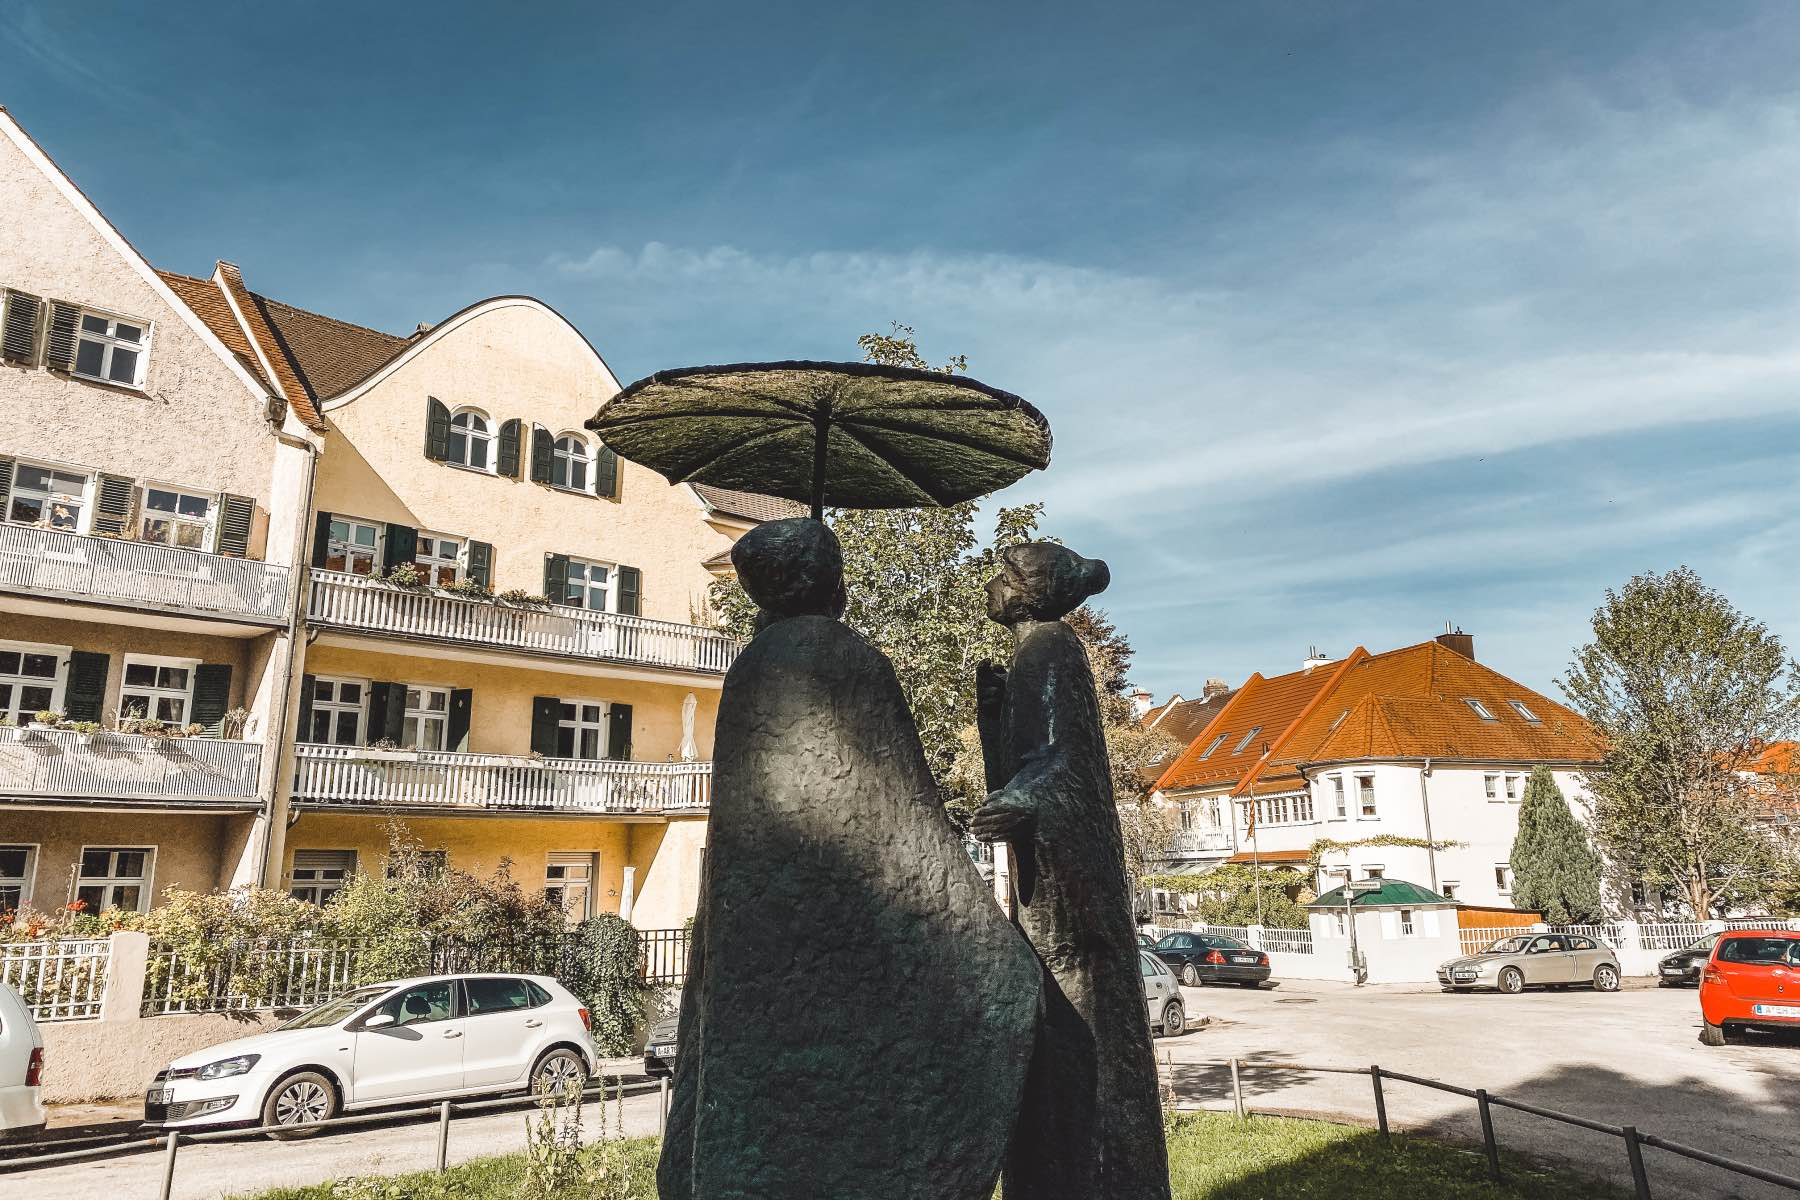 Augsburger Stadtteile Thelottviertel